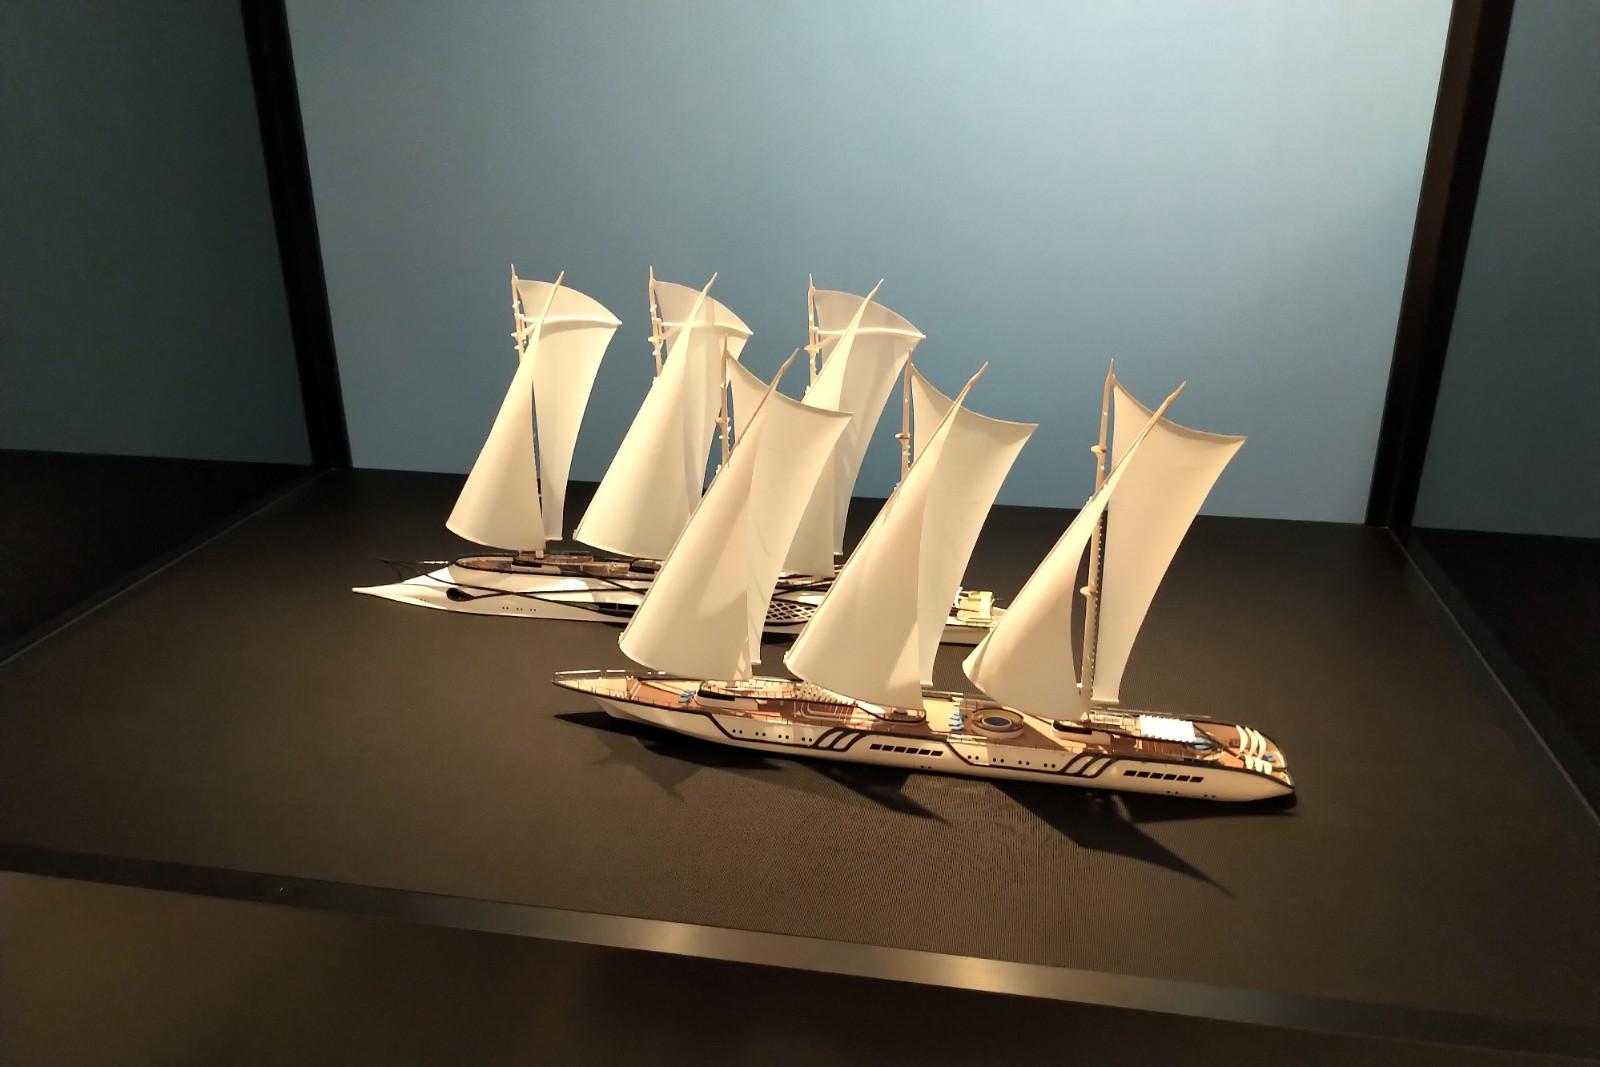 Custom yacht, Futuristic design, Super yacht, Luxury Yacht.